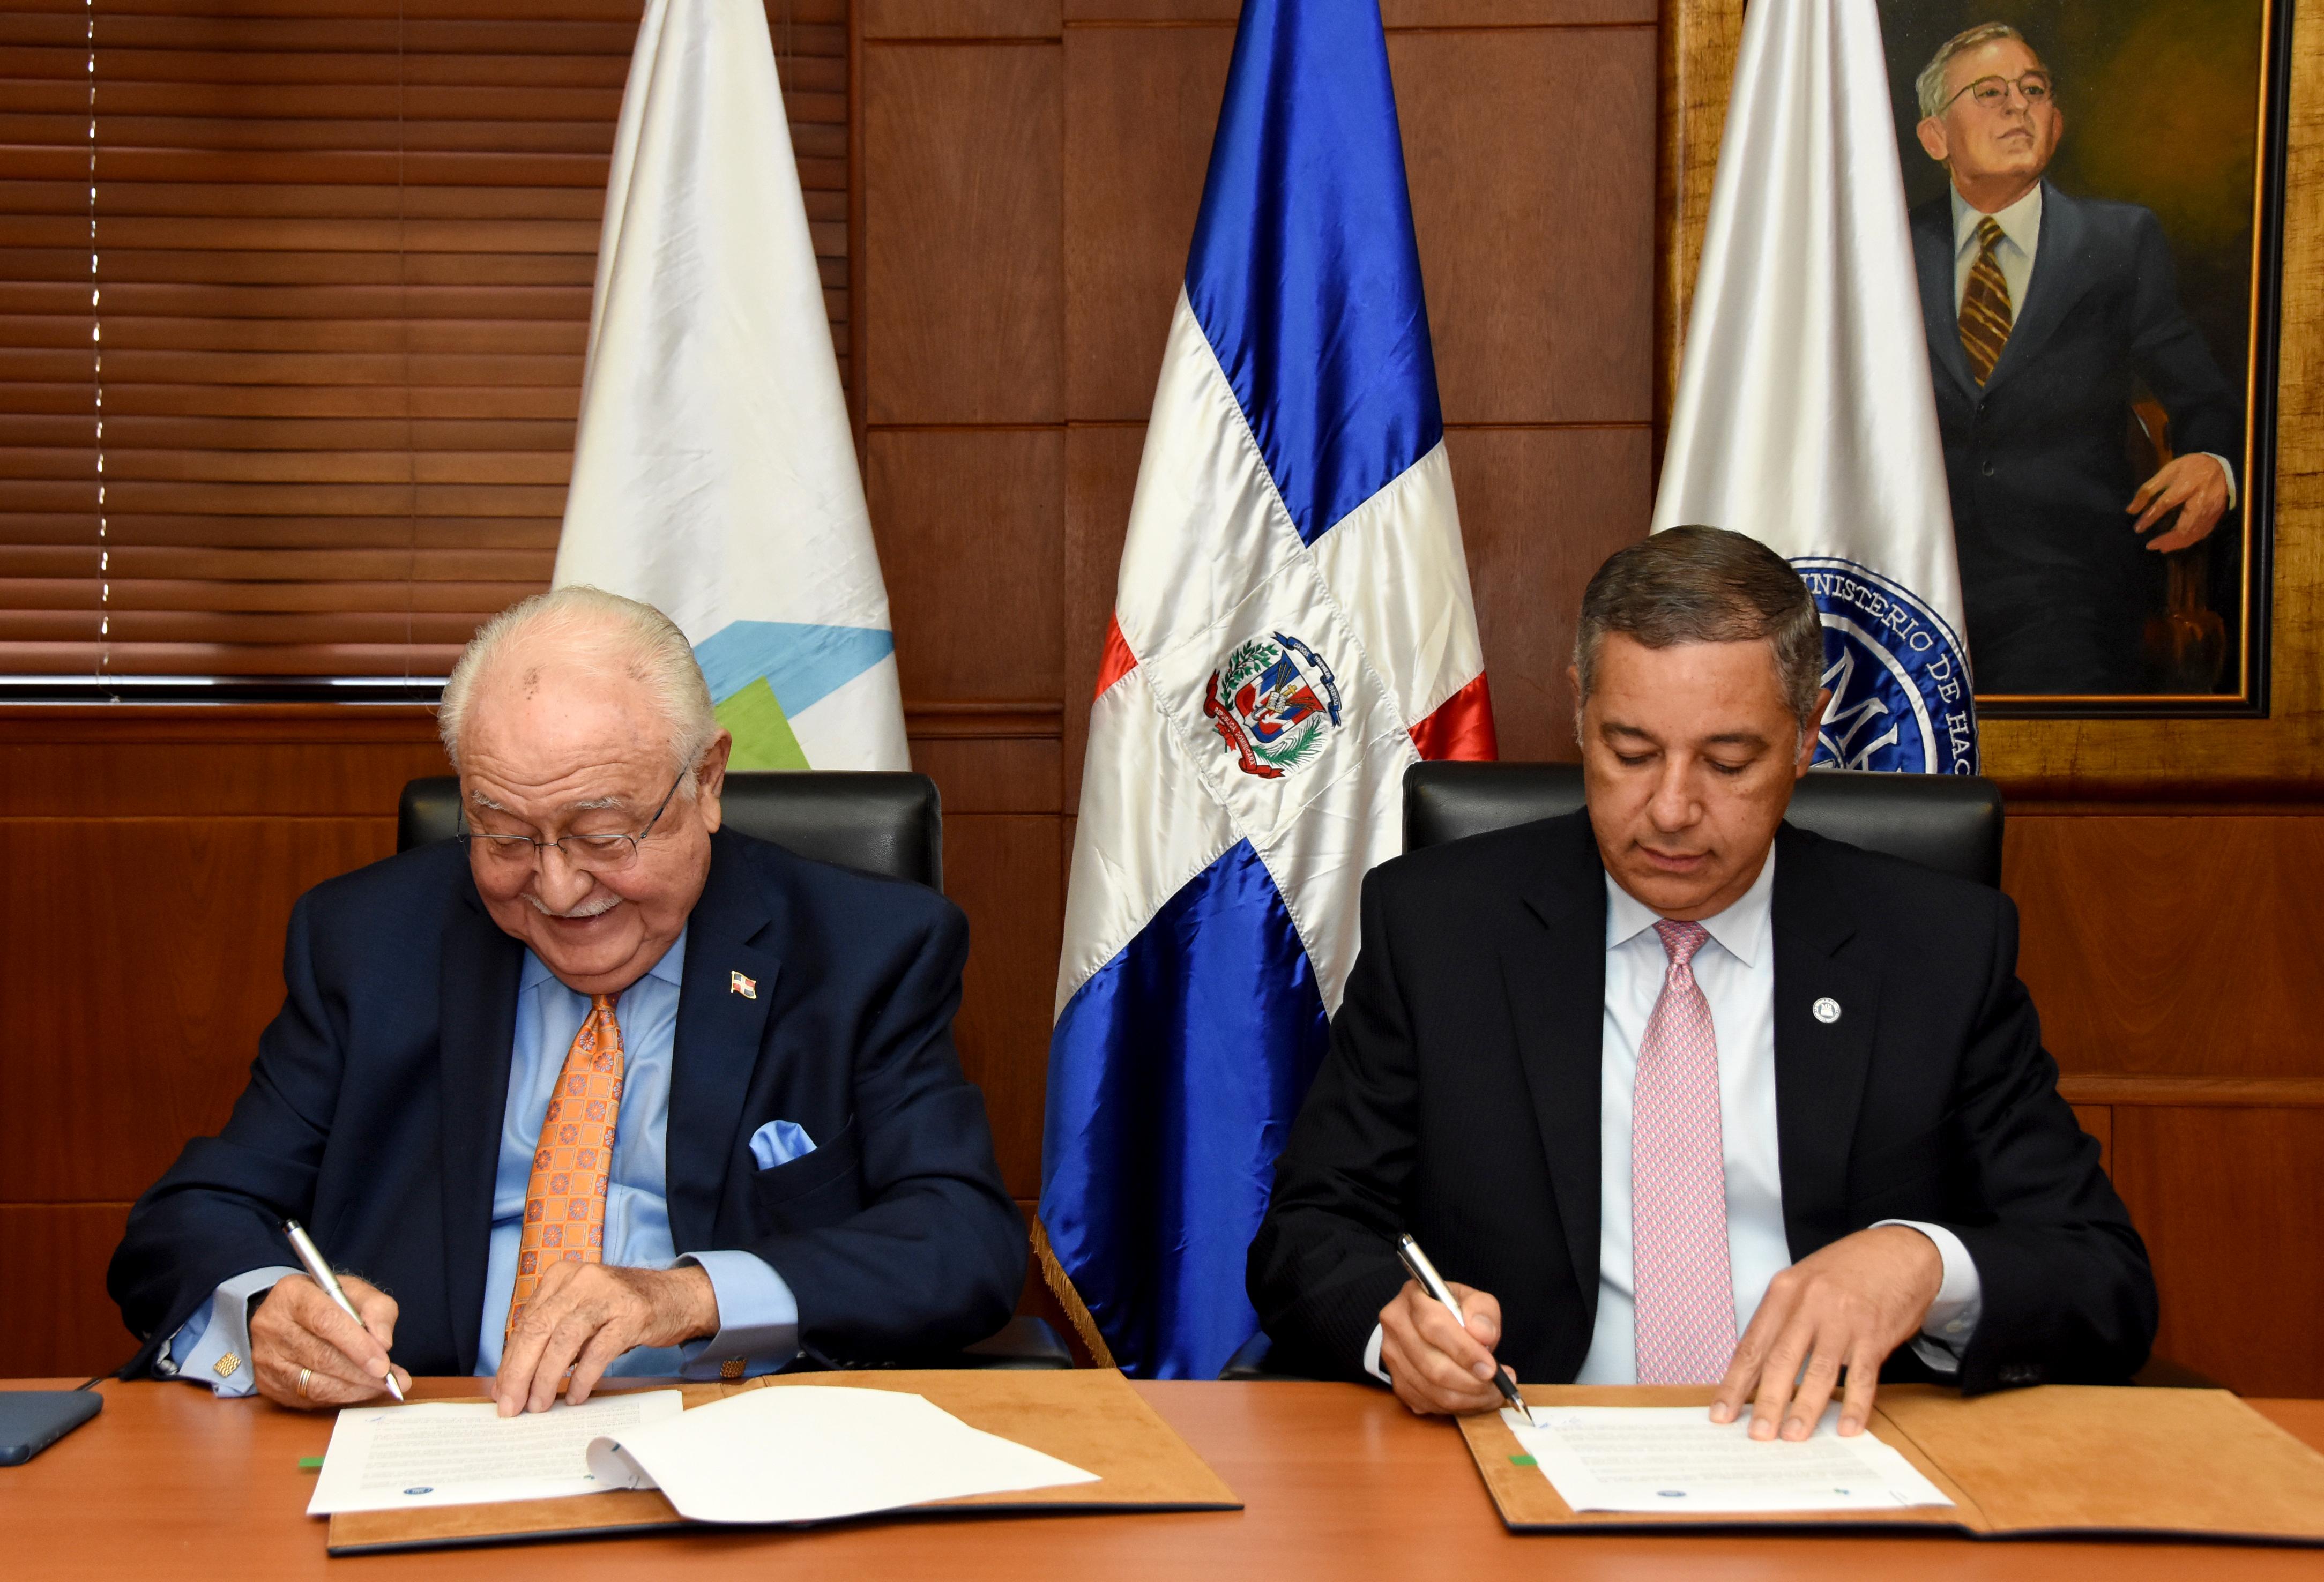 Firman resolución para garantizar electricidad a entidades públicas